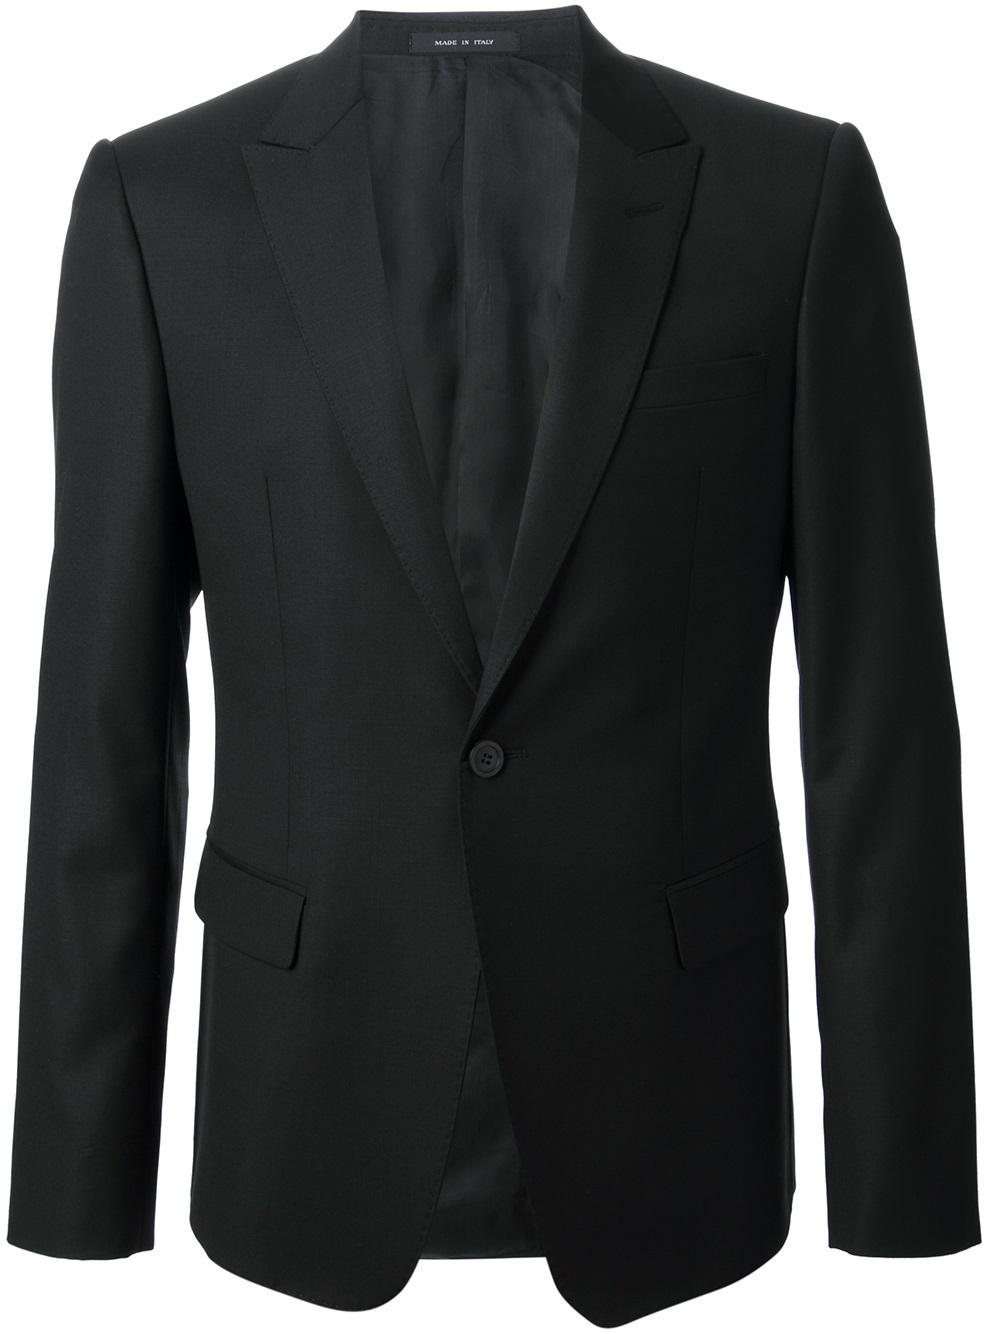 Emporio armani David Line Suit in Black for Men   Lyst